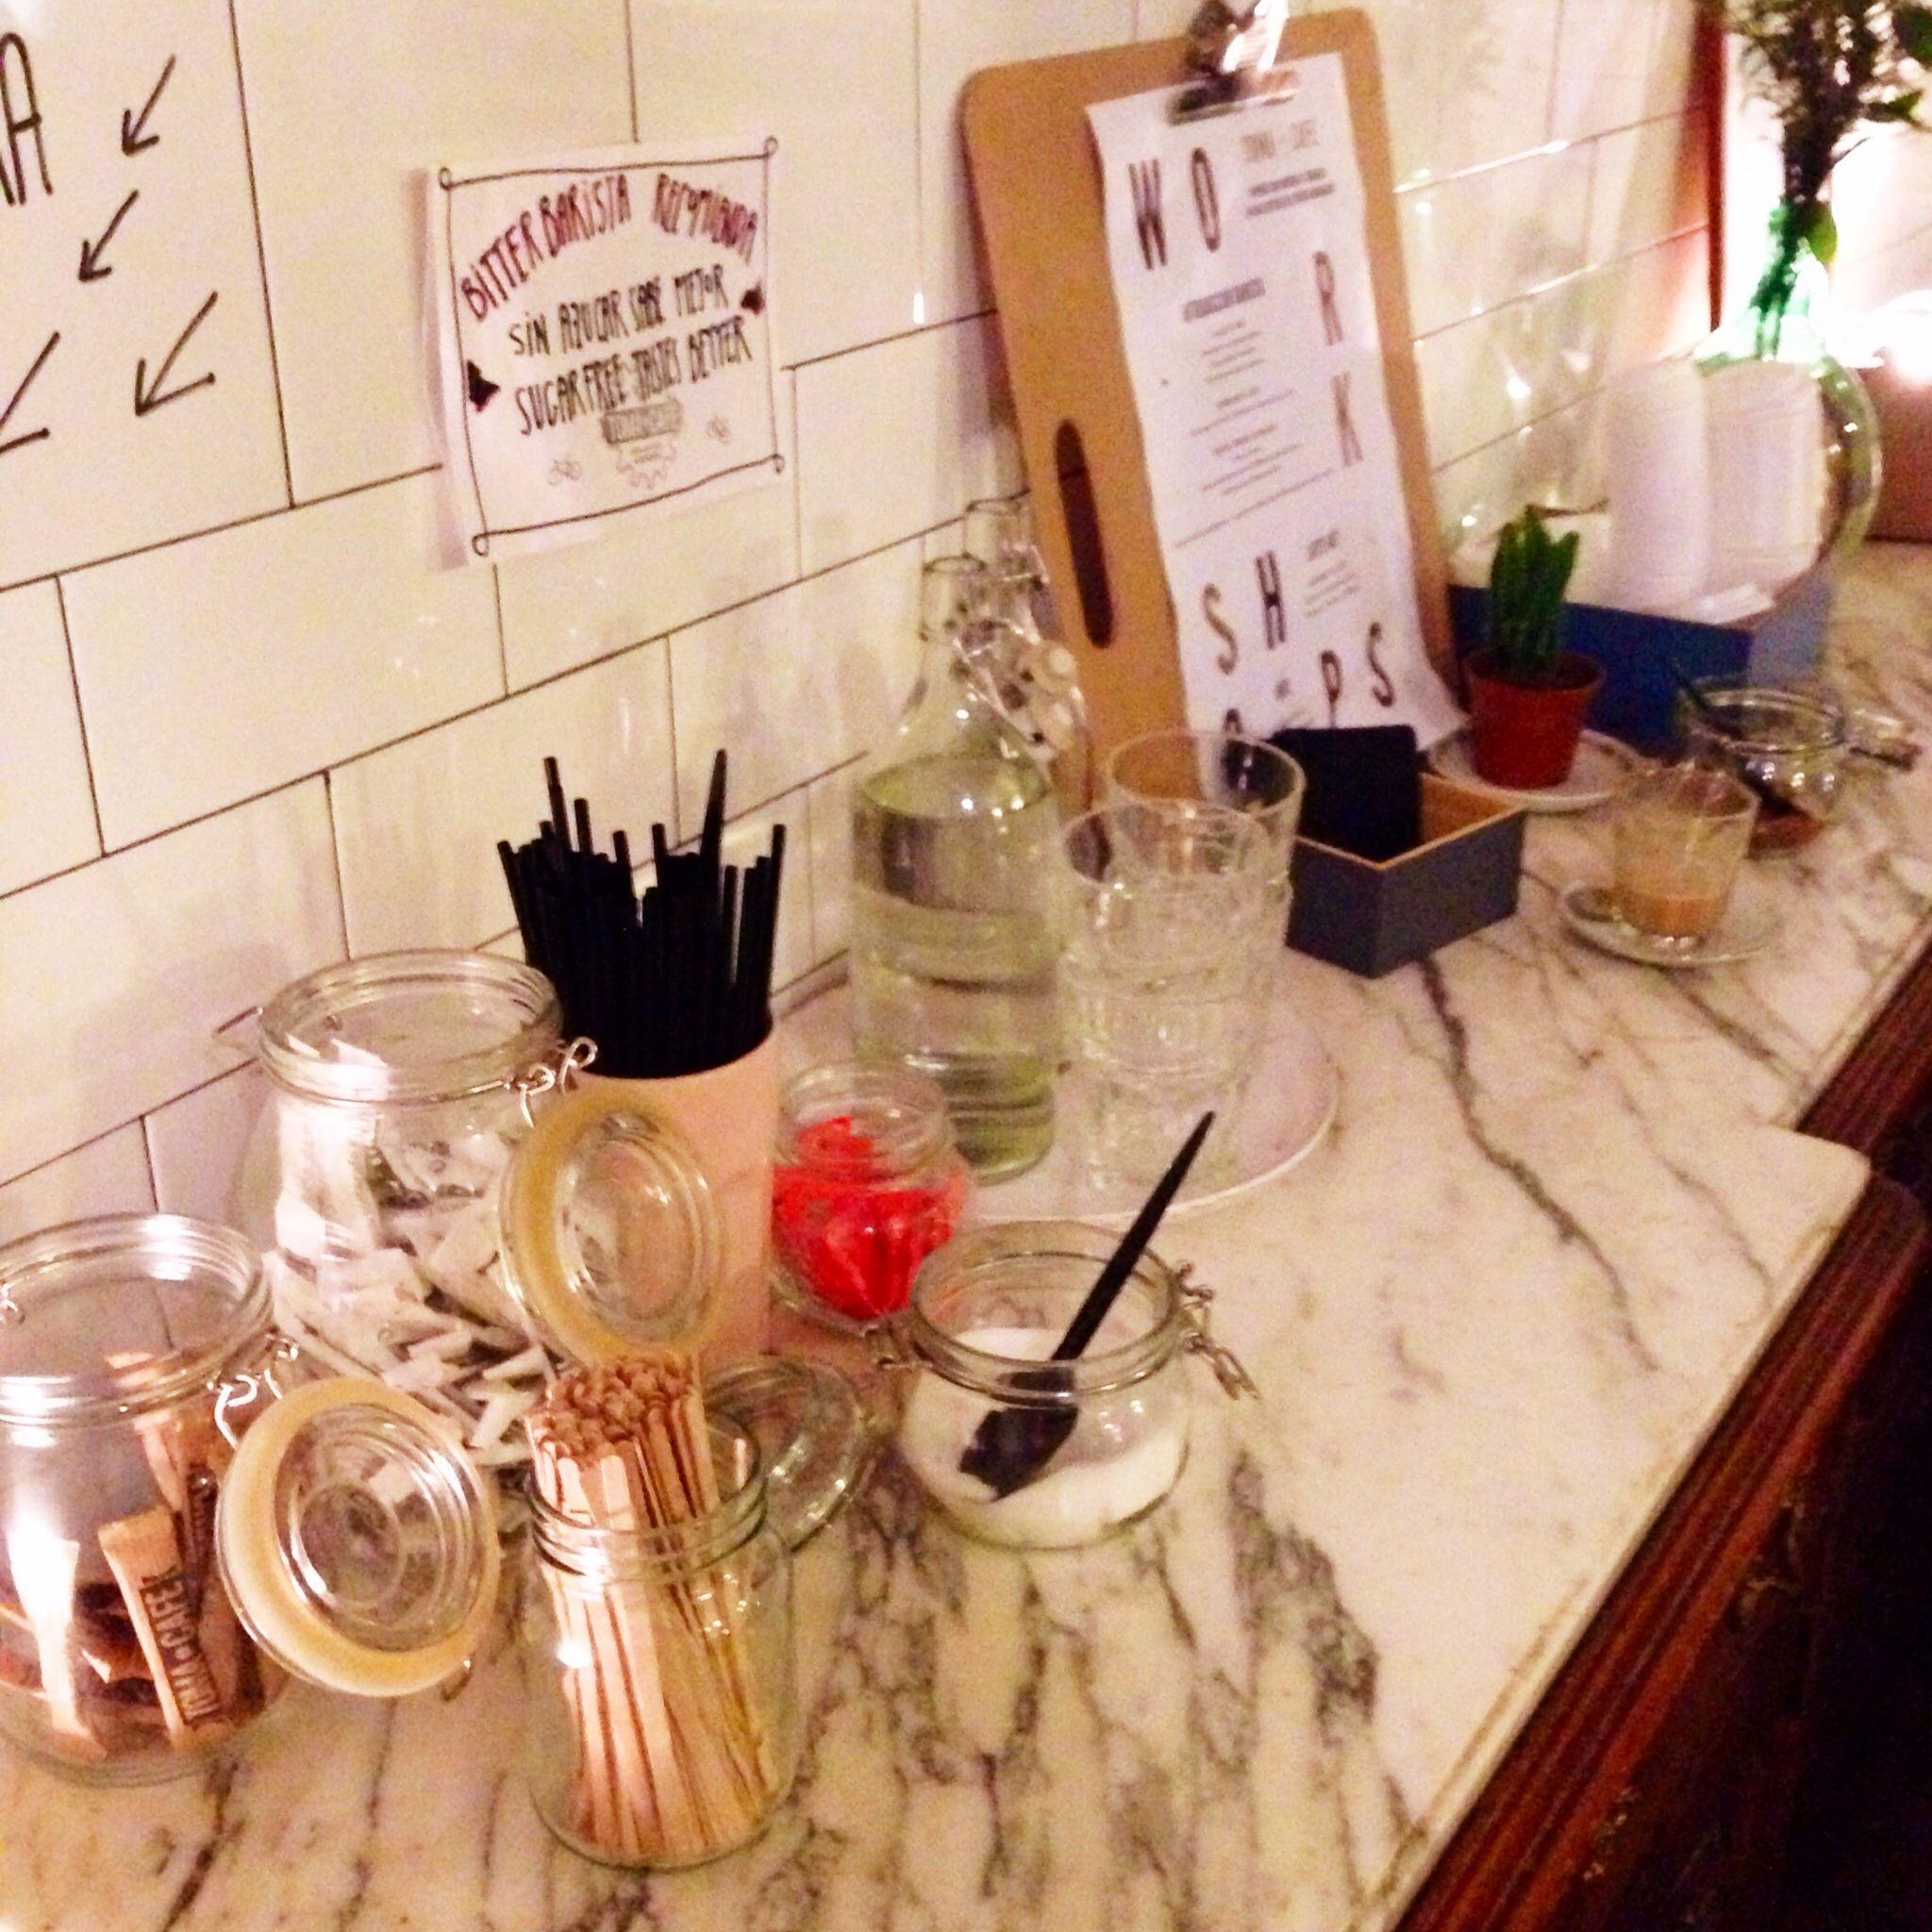 Self-service table in Toma Café, Madrid | Coffee shop design ideas ...